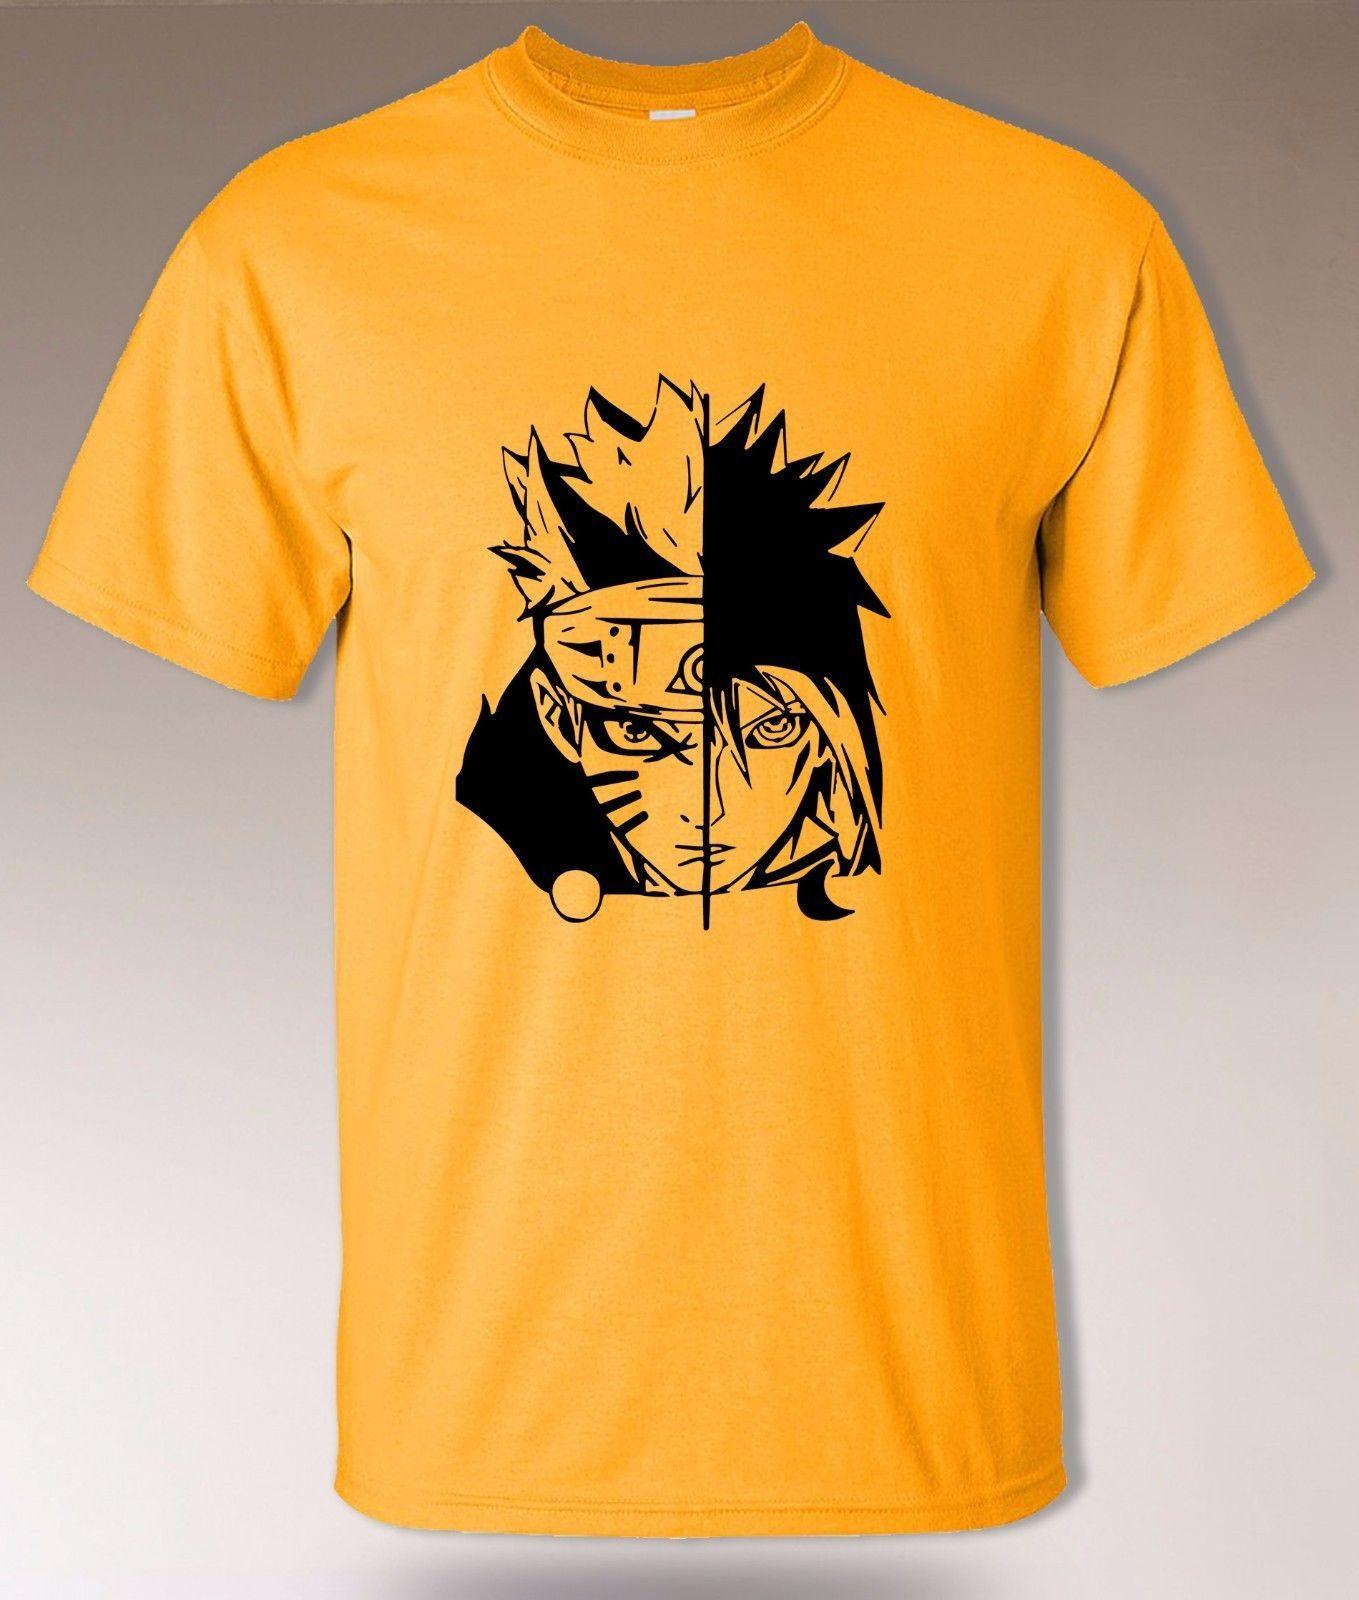 cf3e7e324 Naruto And Sasuke T Shirt, Uchiha Vs Uzumaki Clan, Hidden Leaf Konoha  Shinobi Funny Unisex Casual Tee Gift Buy Funky T Shirts Online Ot Shirts  From ...